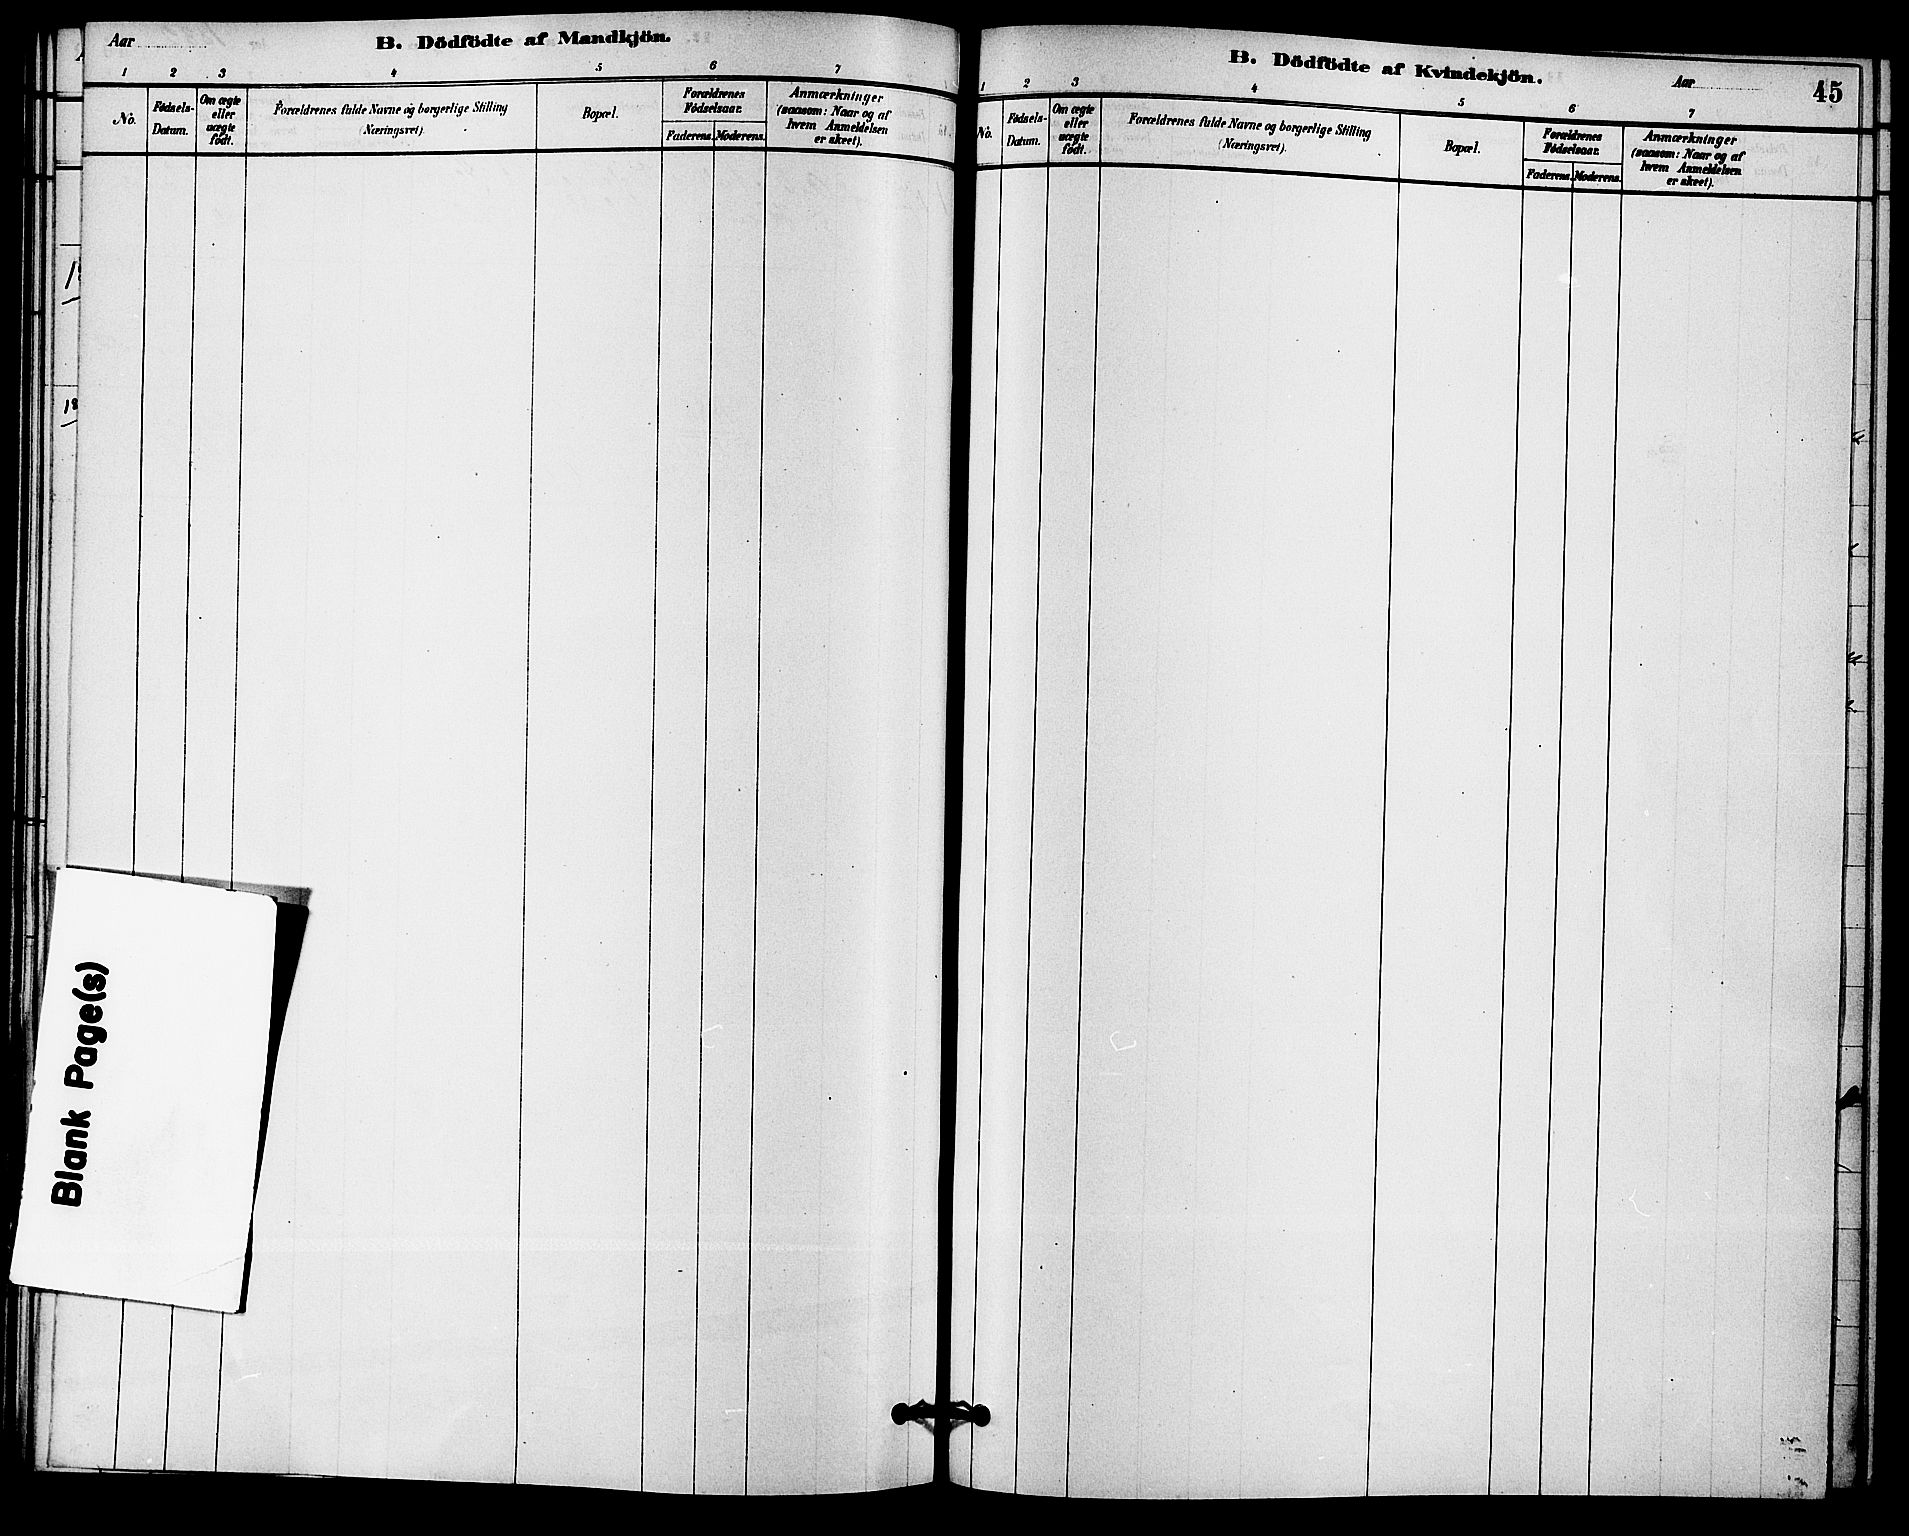 SAKO, Solum kirkebøker, F/Fc/L0001: Ministerialbok nr. III 1, 1877-1891, s. 45